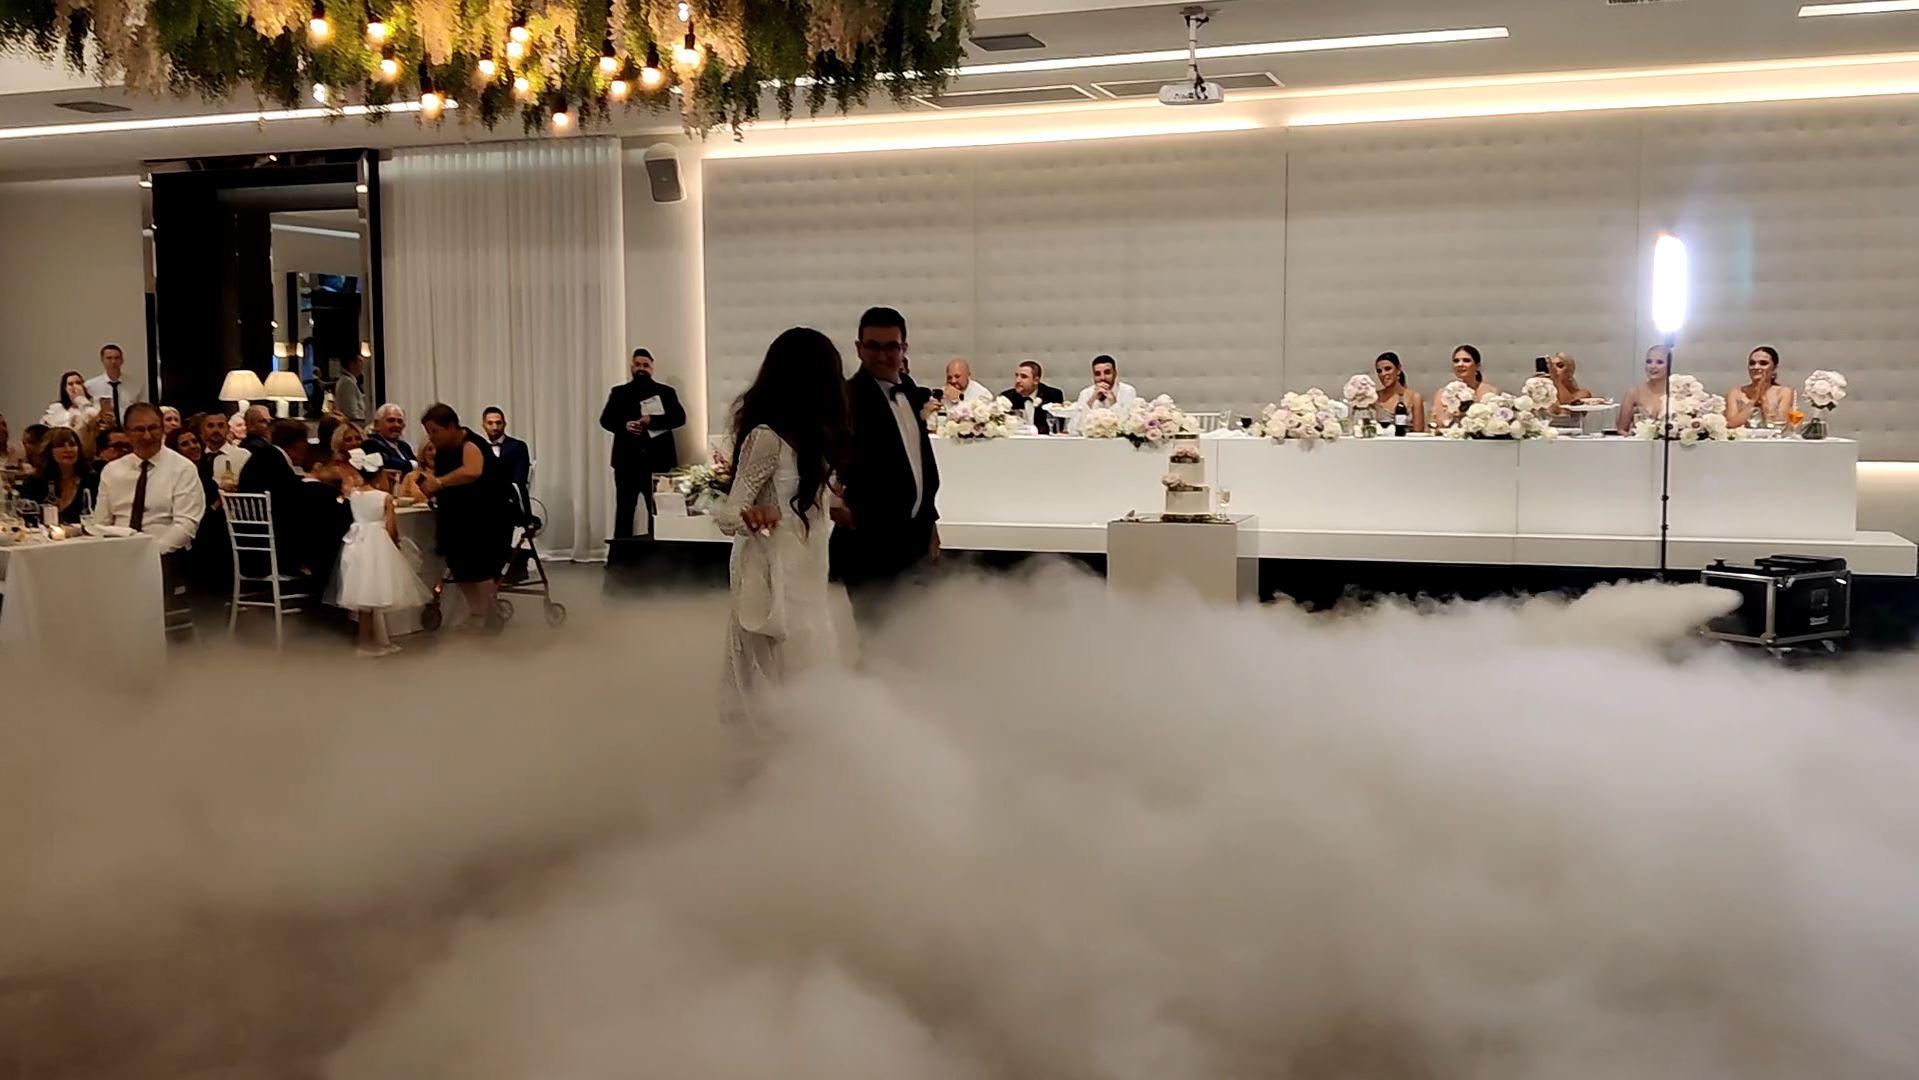 Italian wedding first dance effects